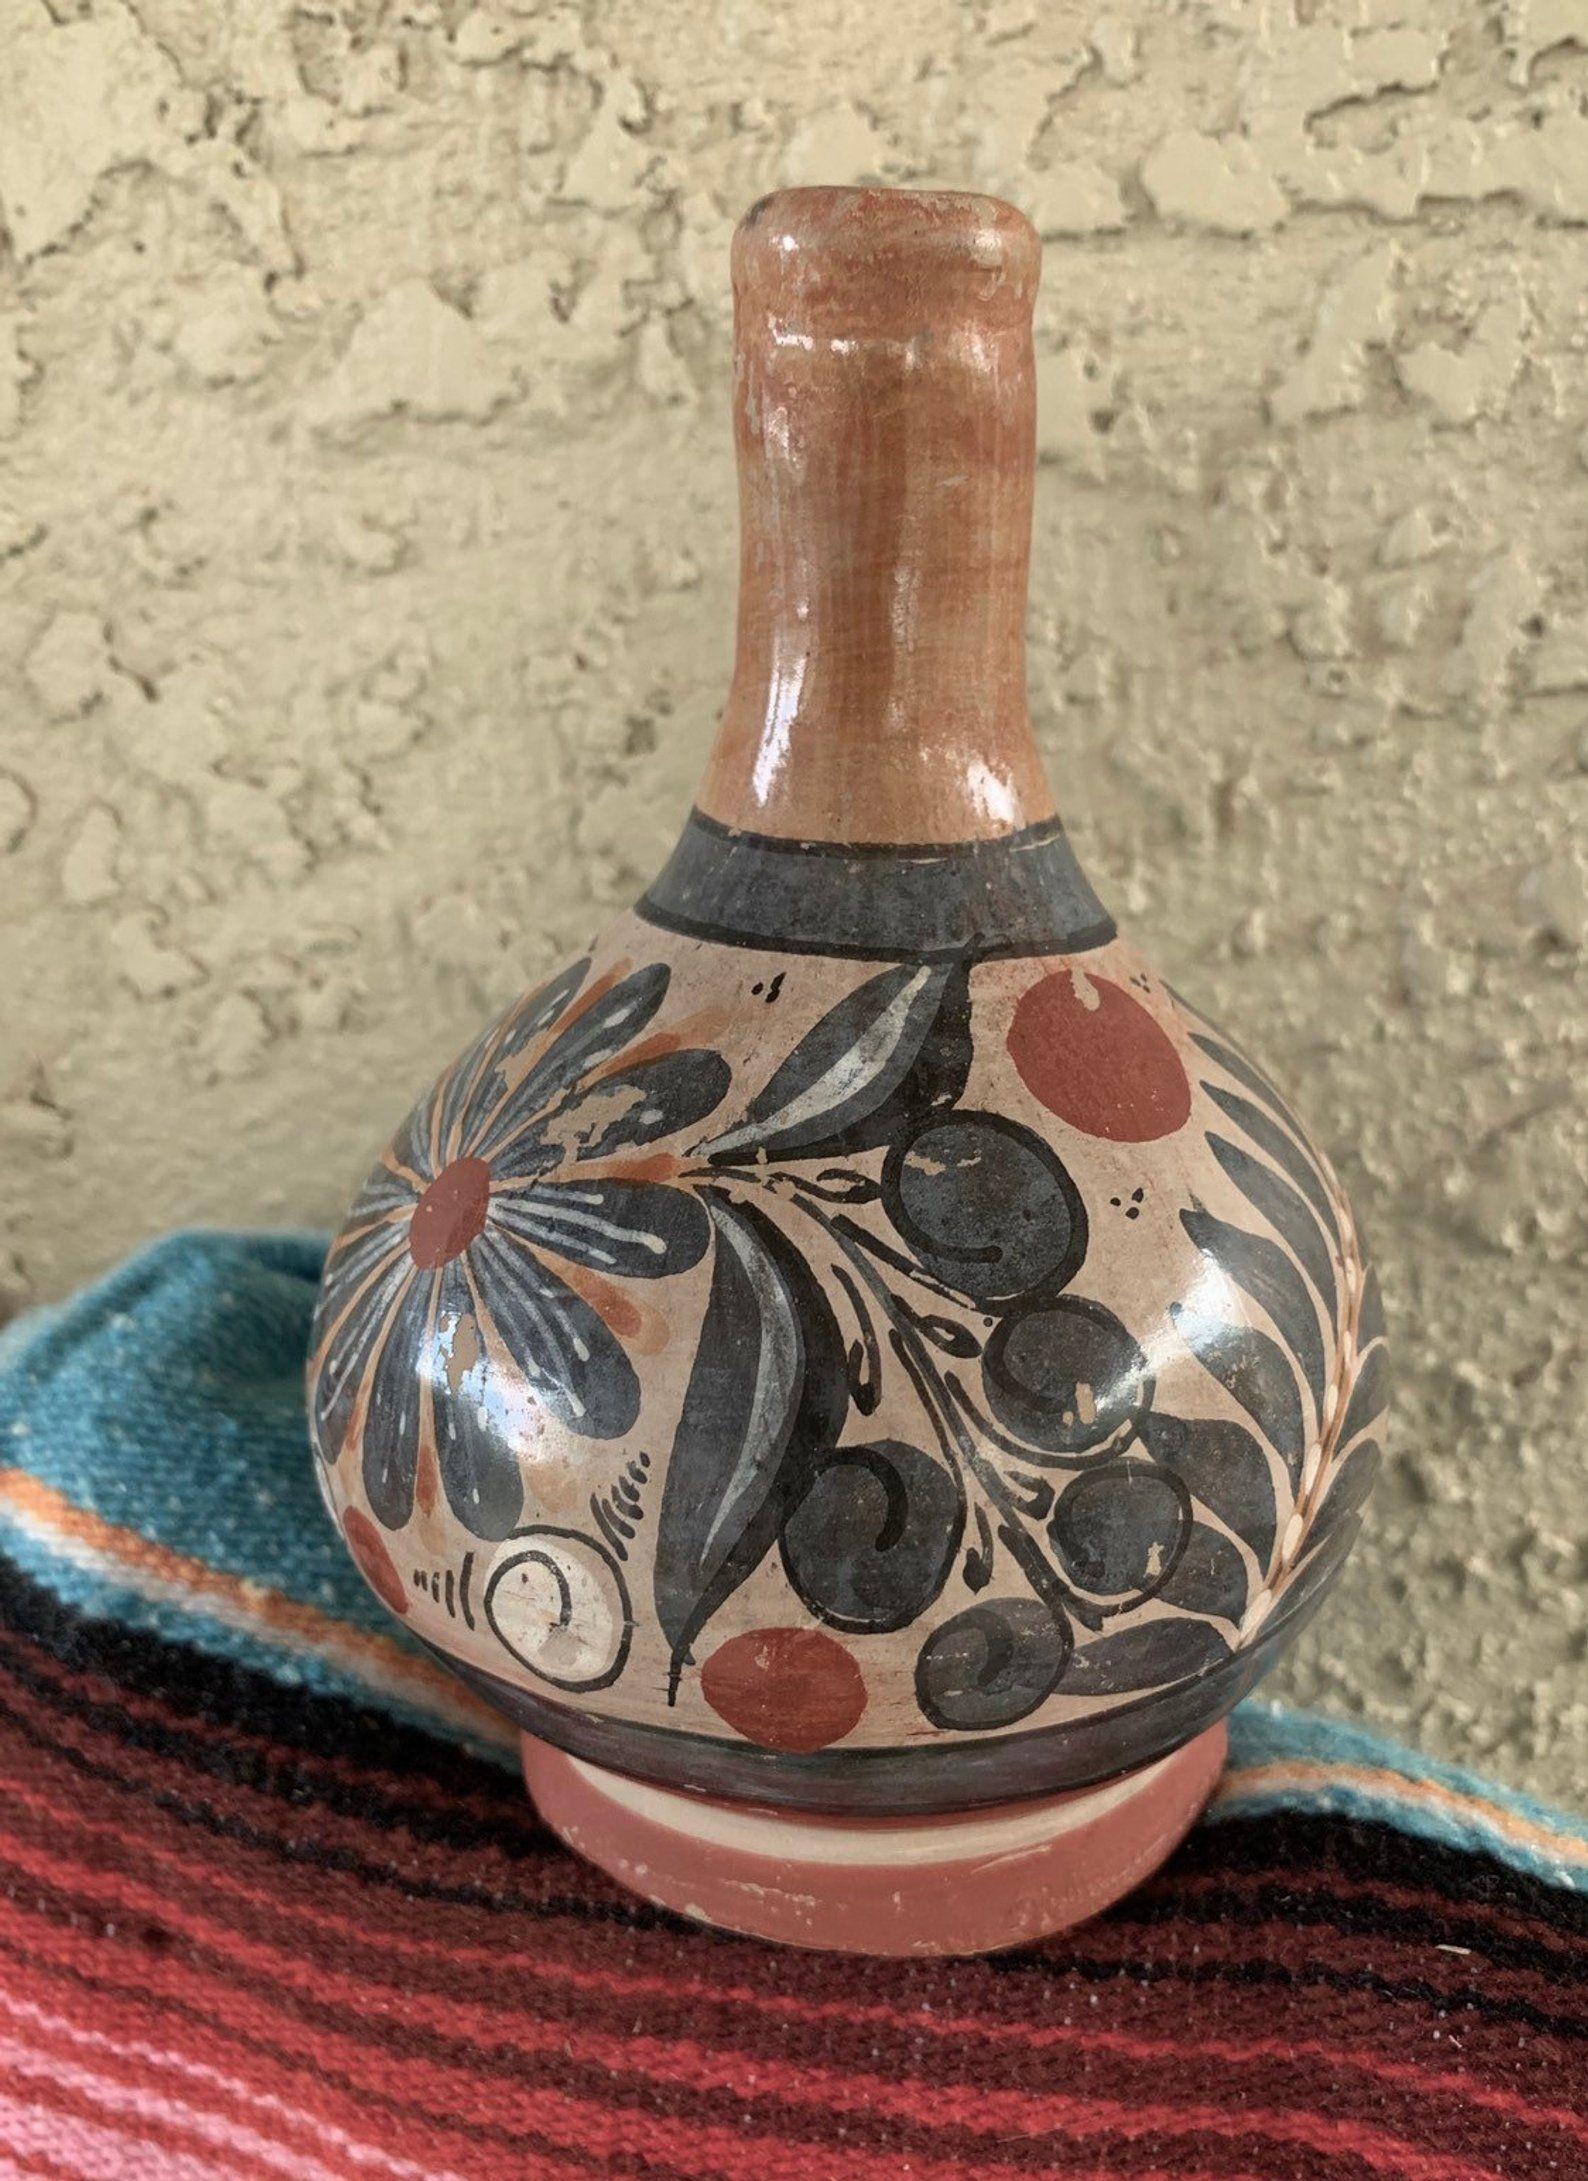 1980/'s Hand painted Pottery Artist Florentino Jimon Mexican Folk Art Jewelry box Vintage Tonala Pottery Box